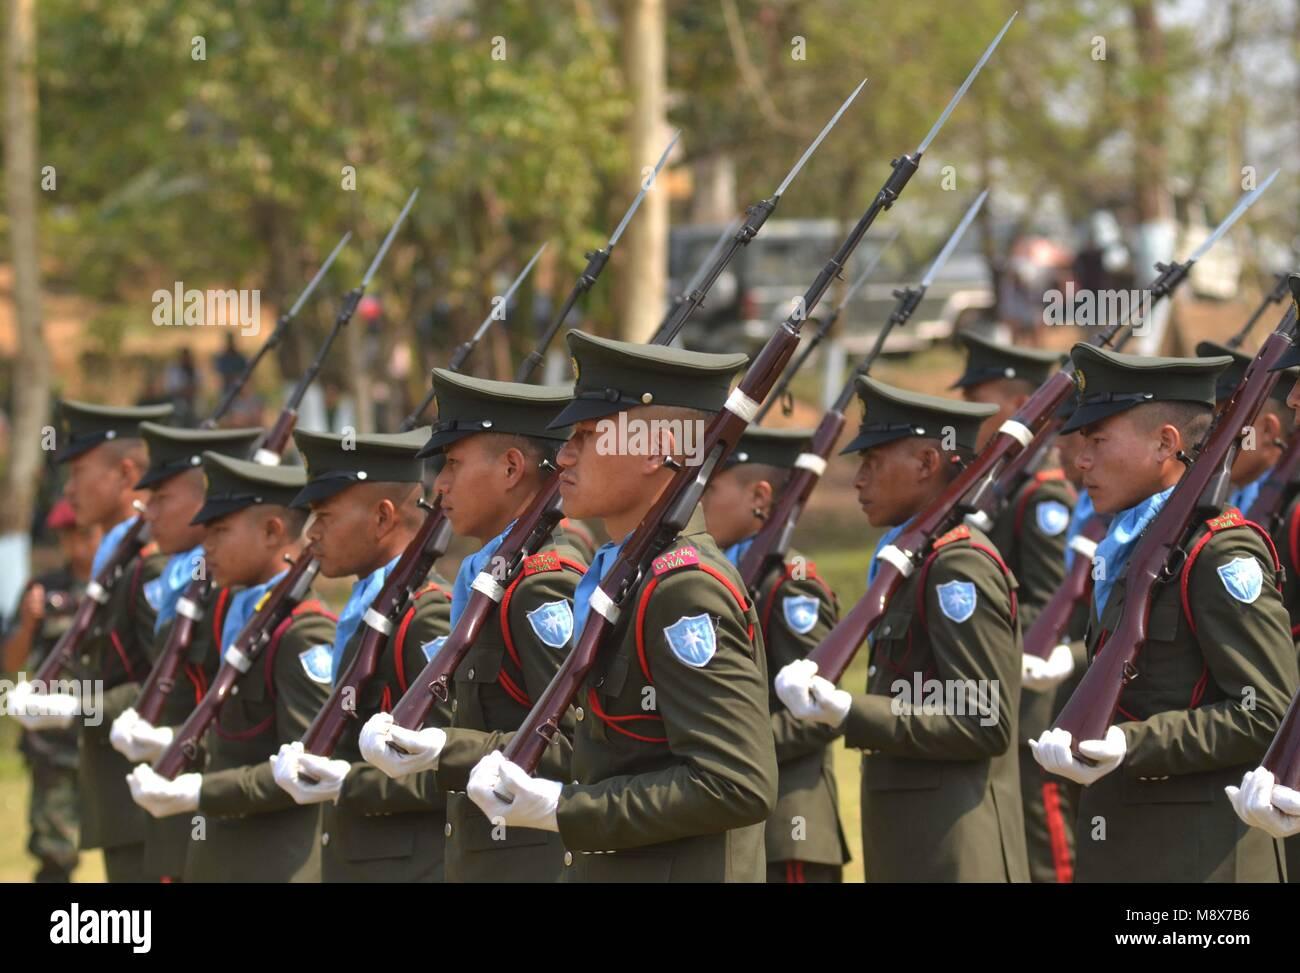 Dimapur, India Mar 21, 2018: Cadres of National Socialist Council of